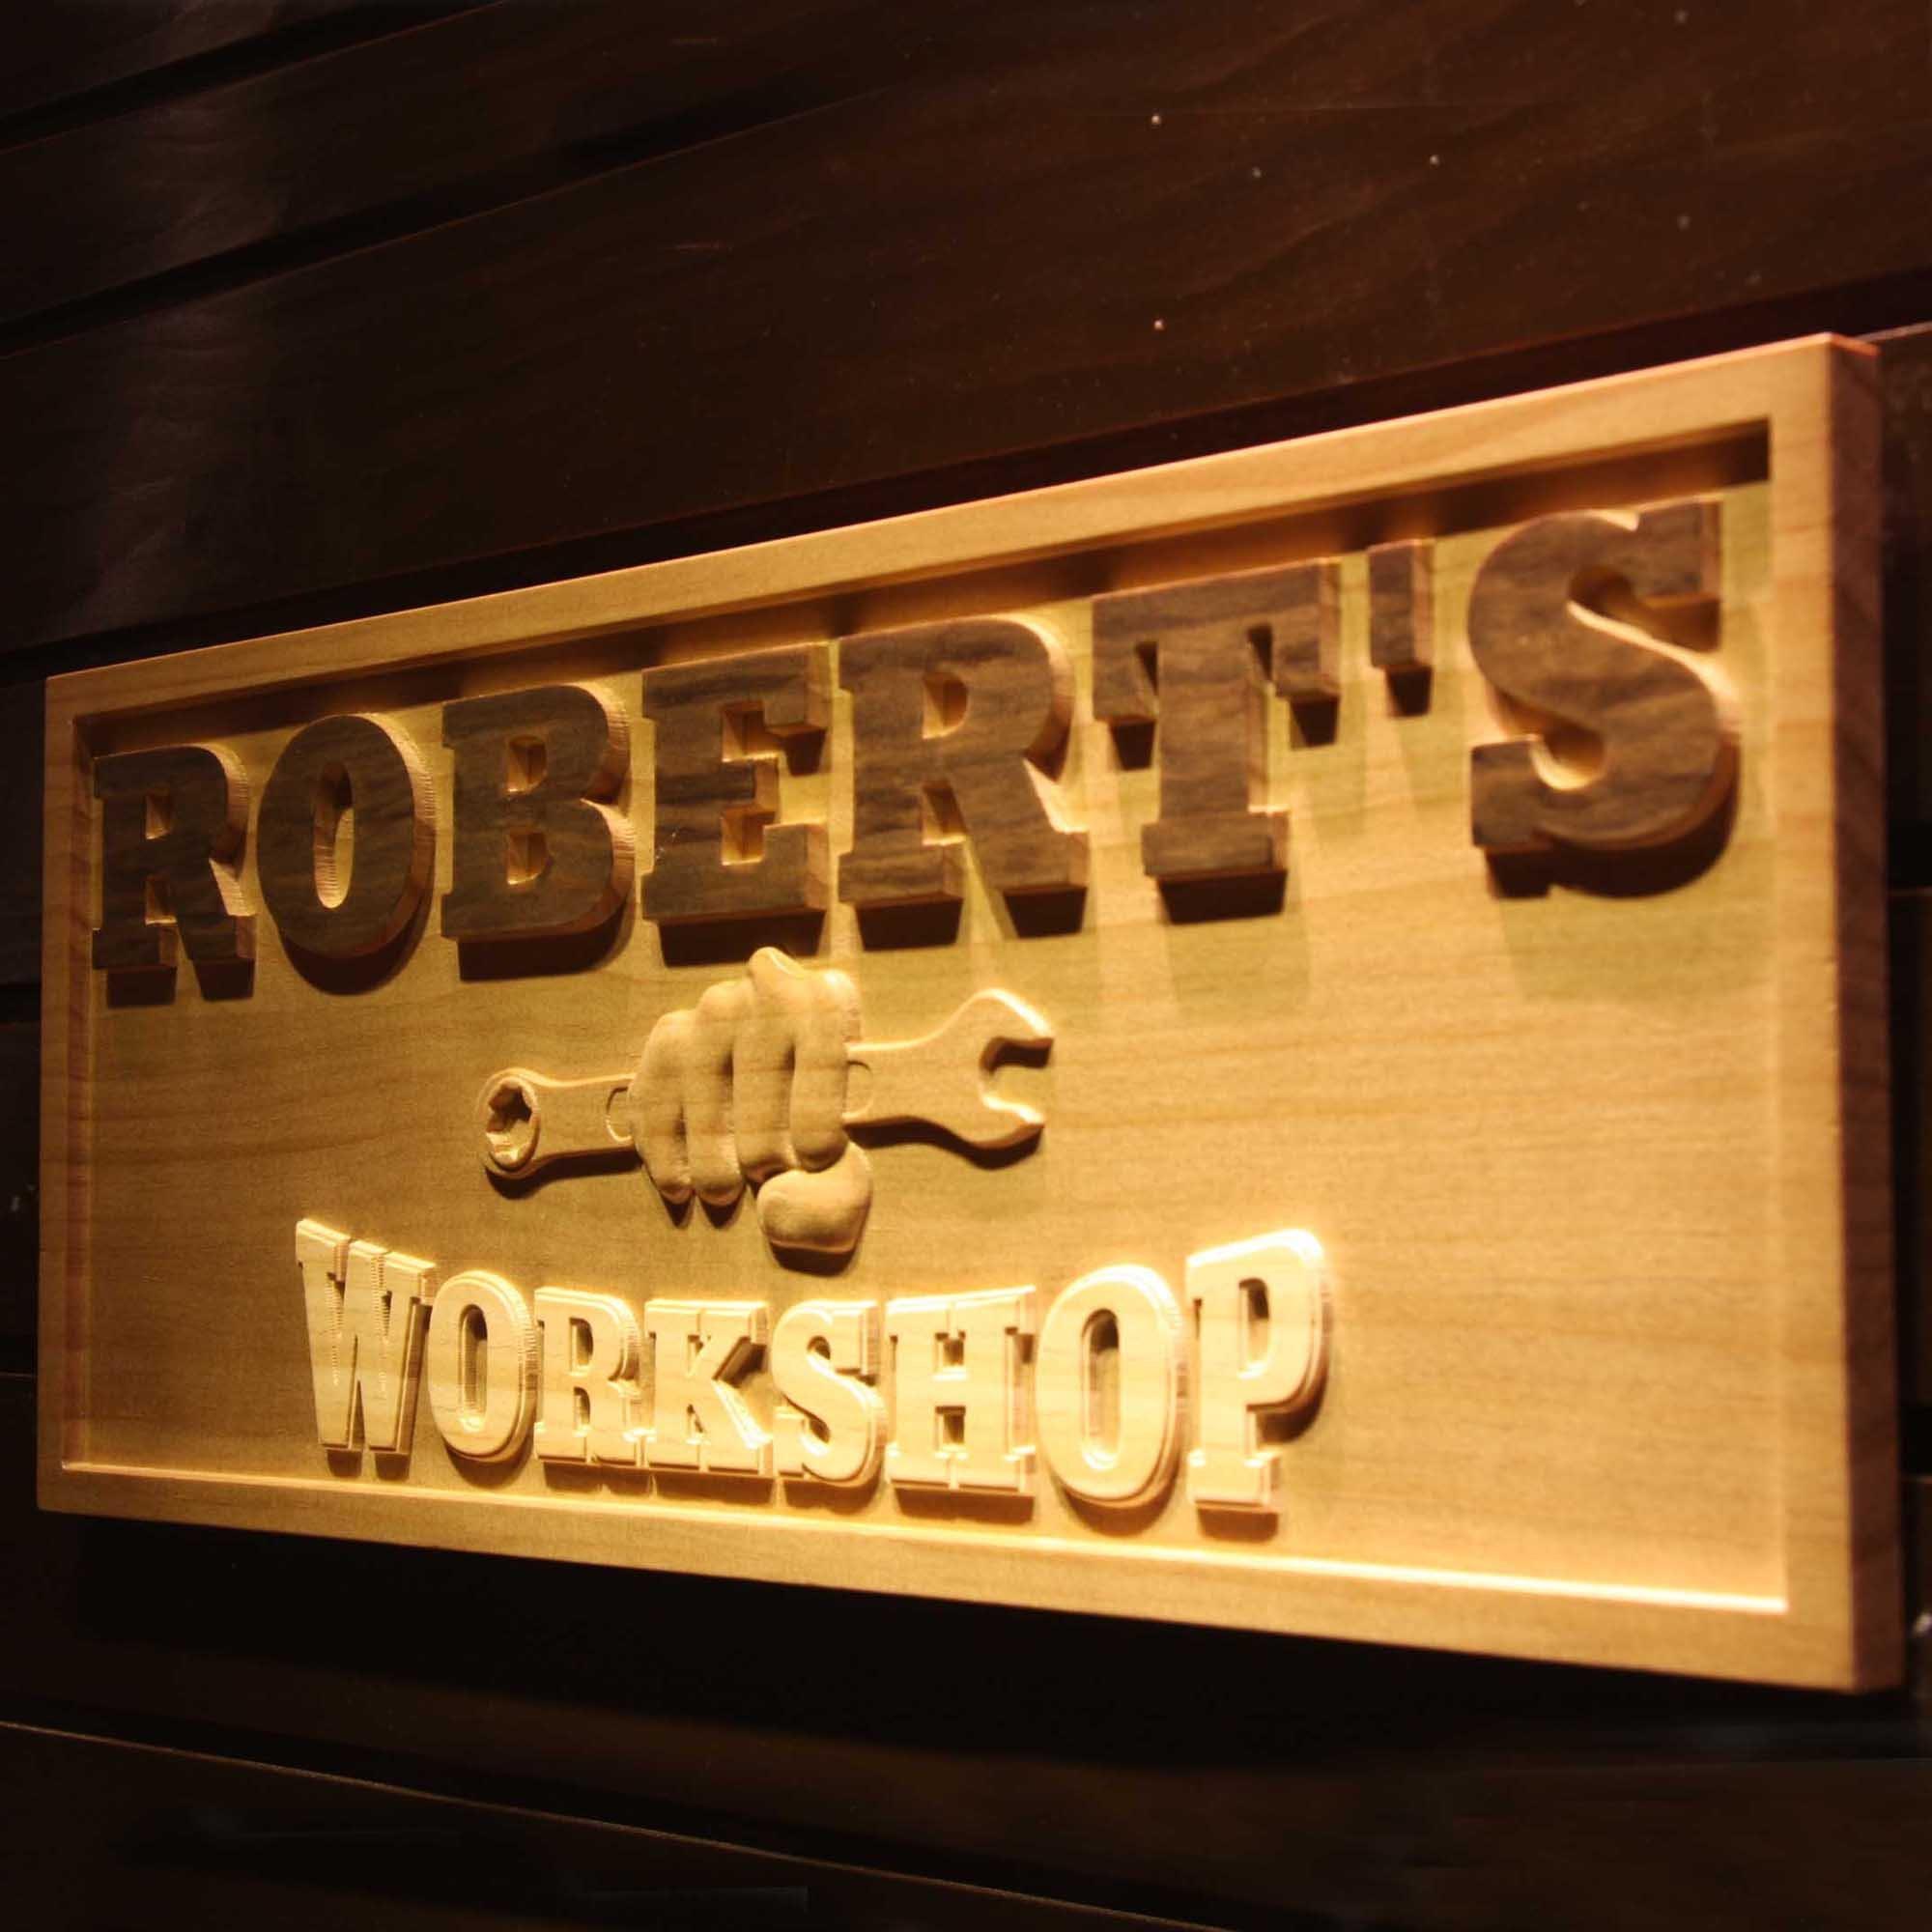 ADVPRO wpa0218 Name Personalized Workshop Garage Man Cave Wood Engraved Wooden Sign - Standard 23'' x 9.25''